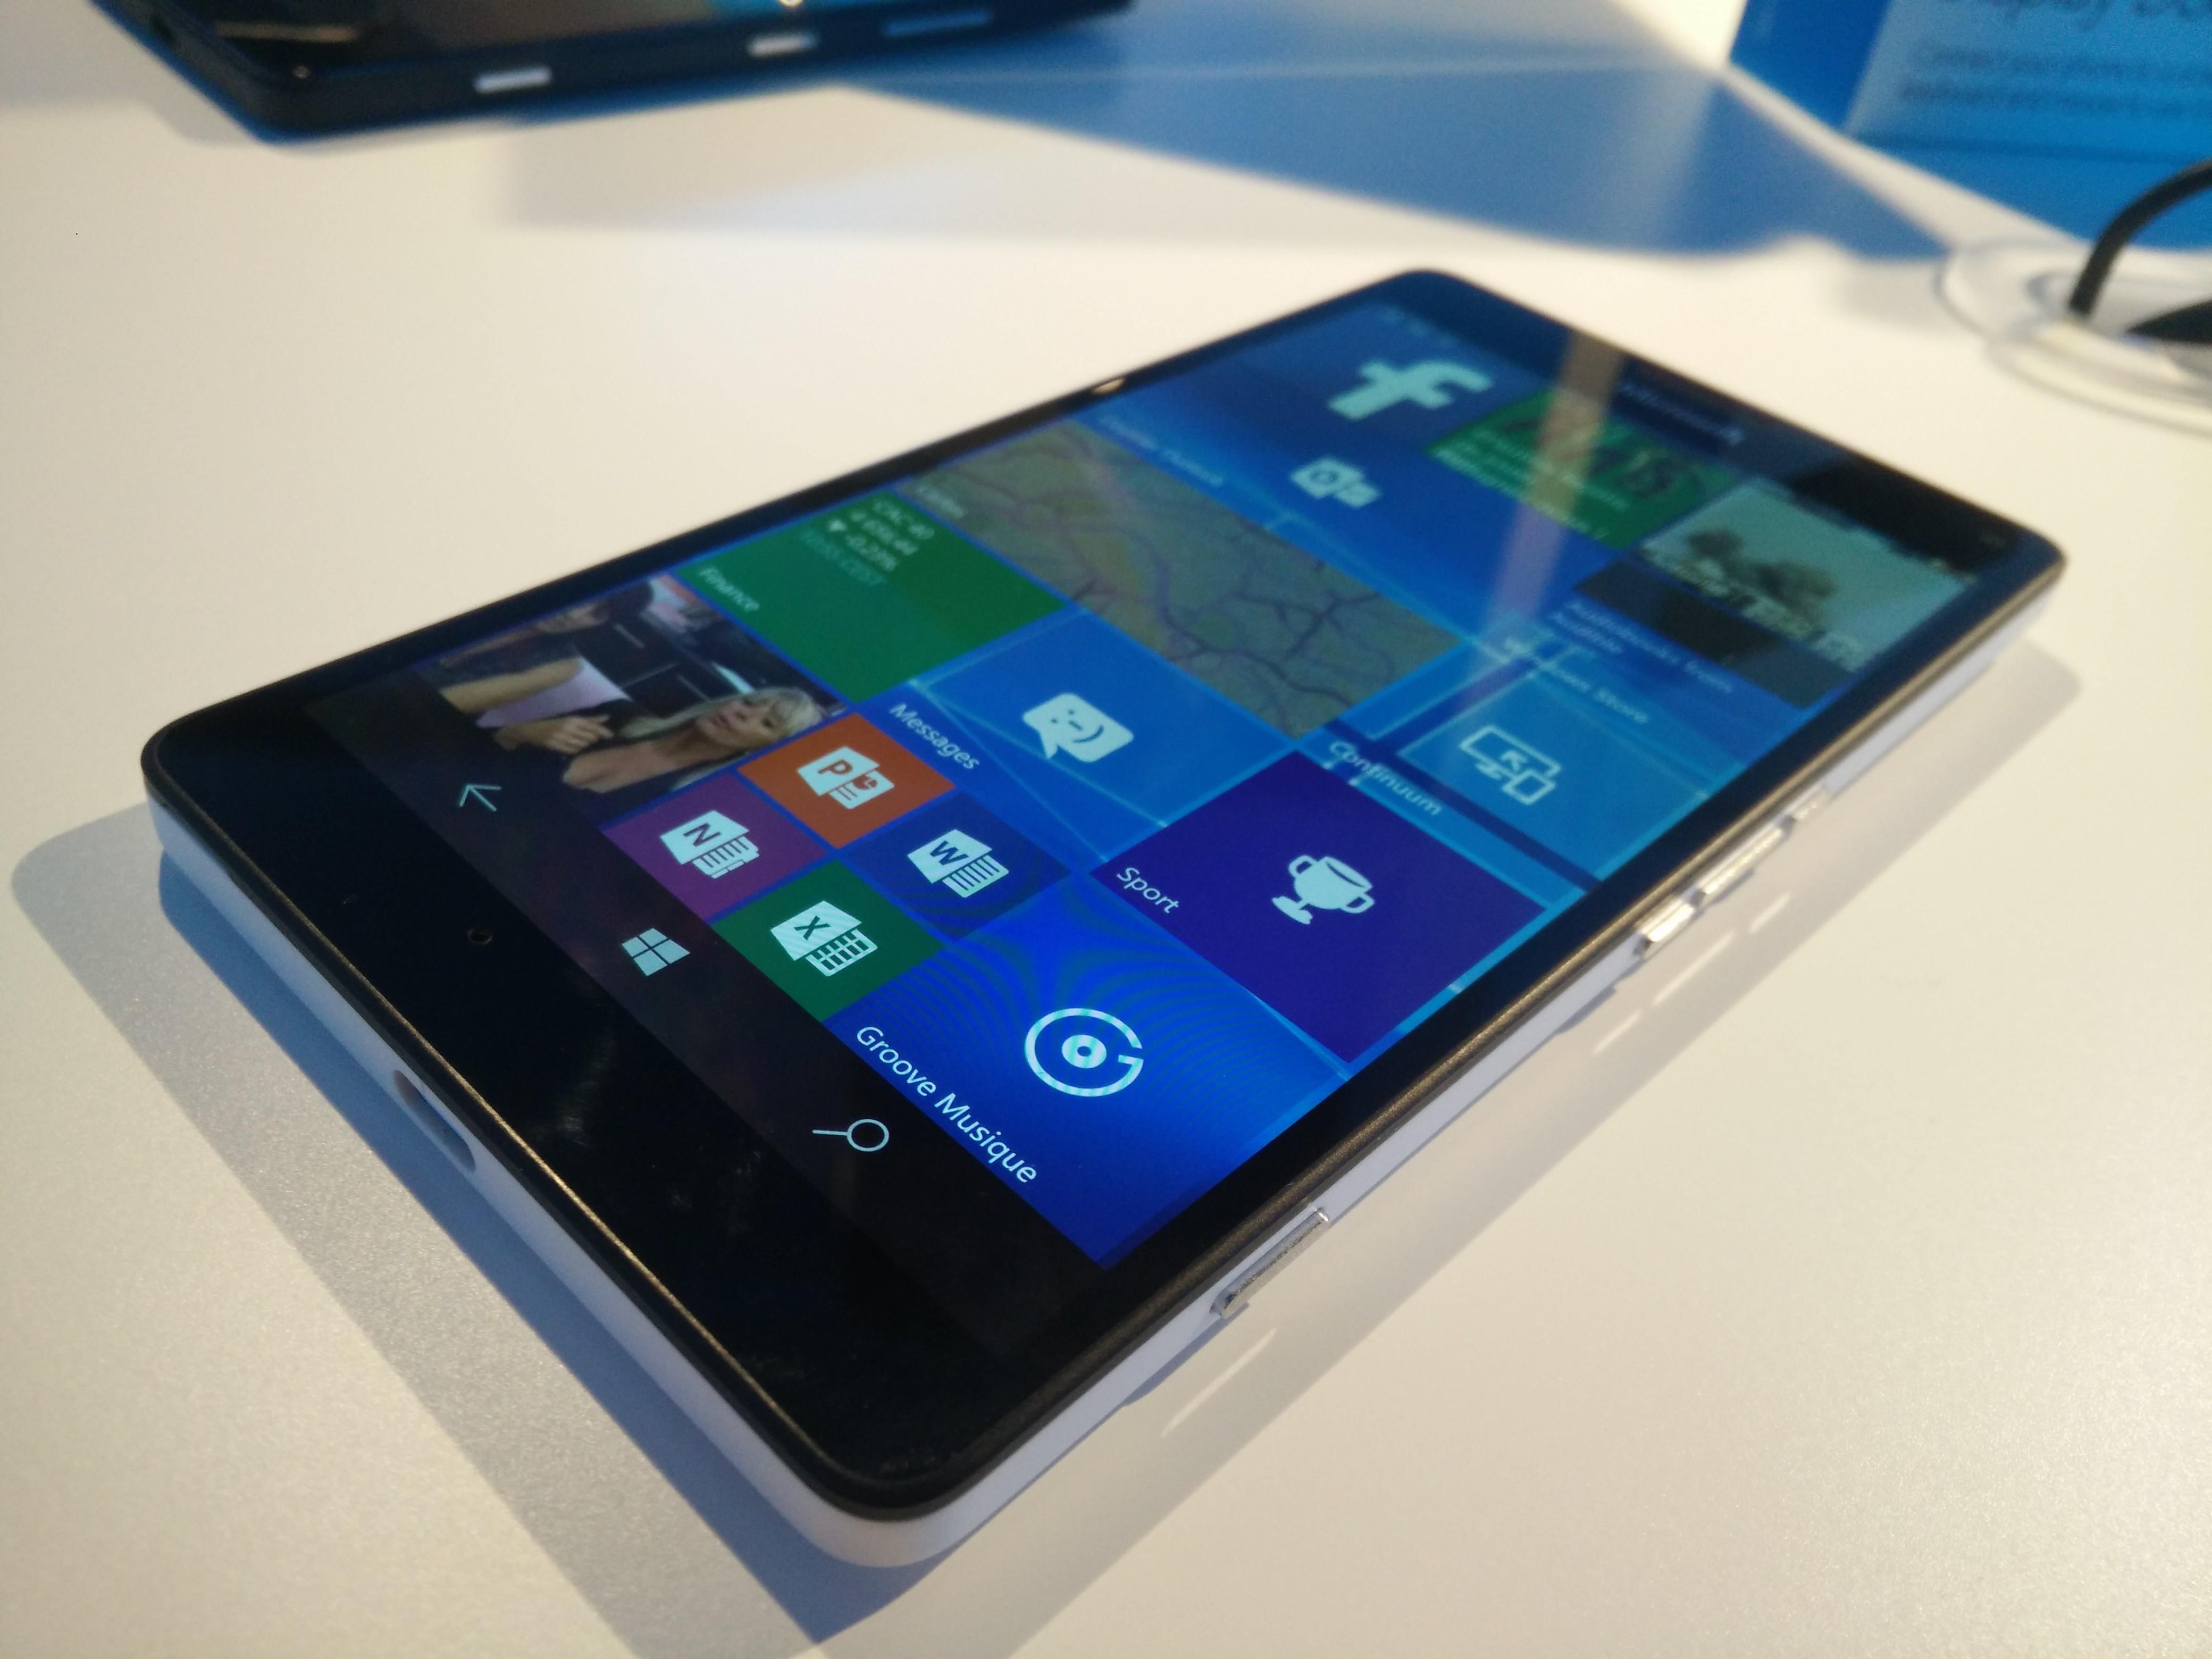 Galerie Photo Des Microsoft Lumia 950 Lumia 950 Xl Et Du